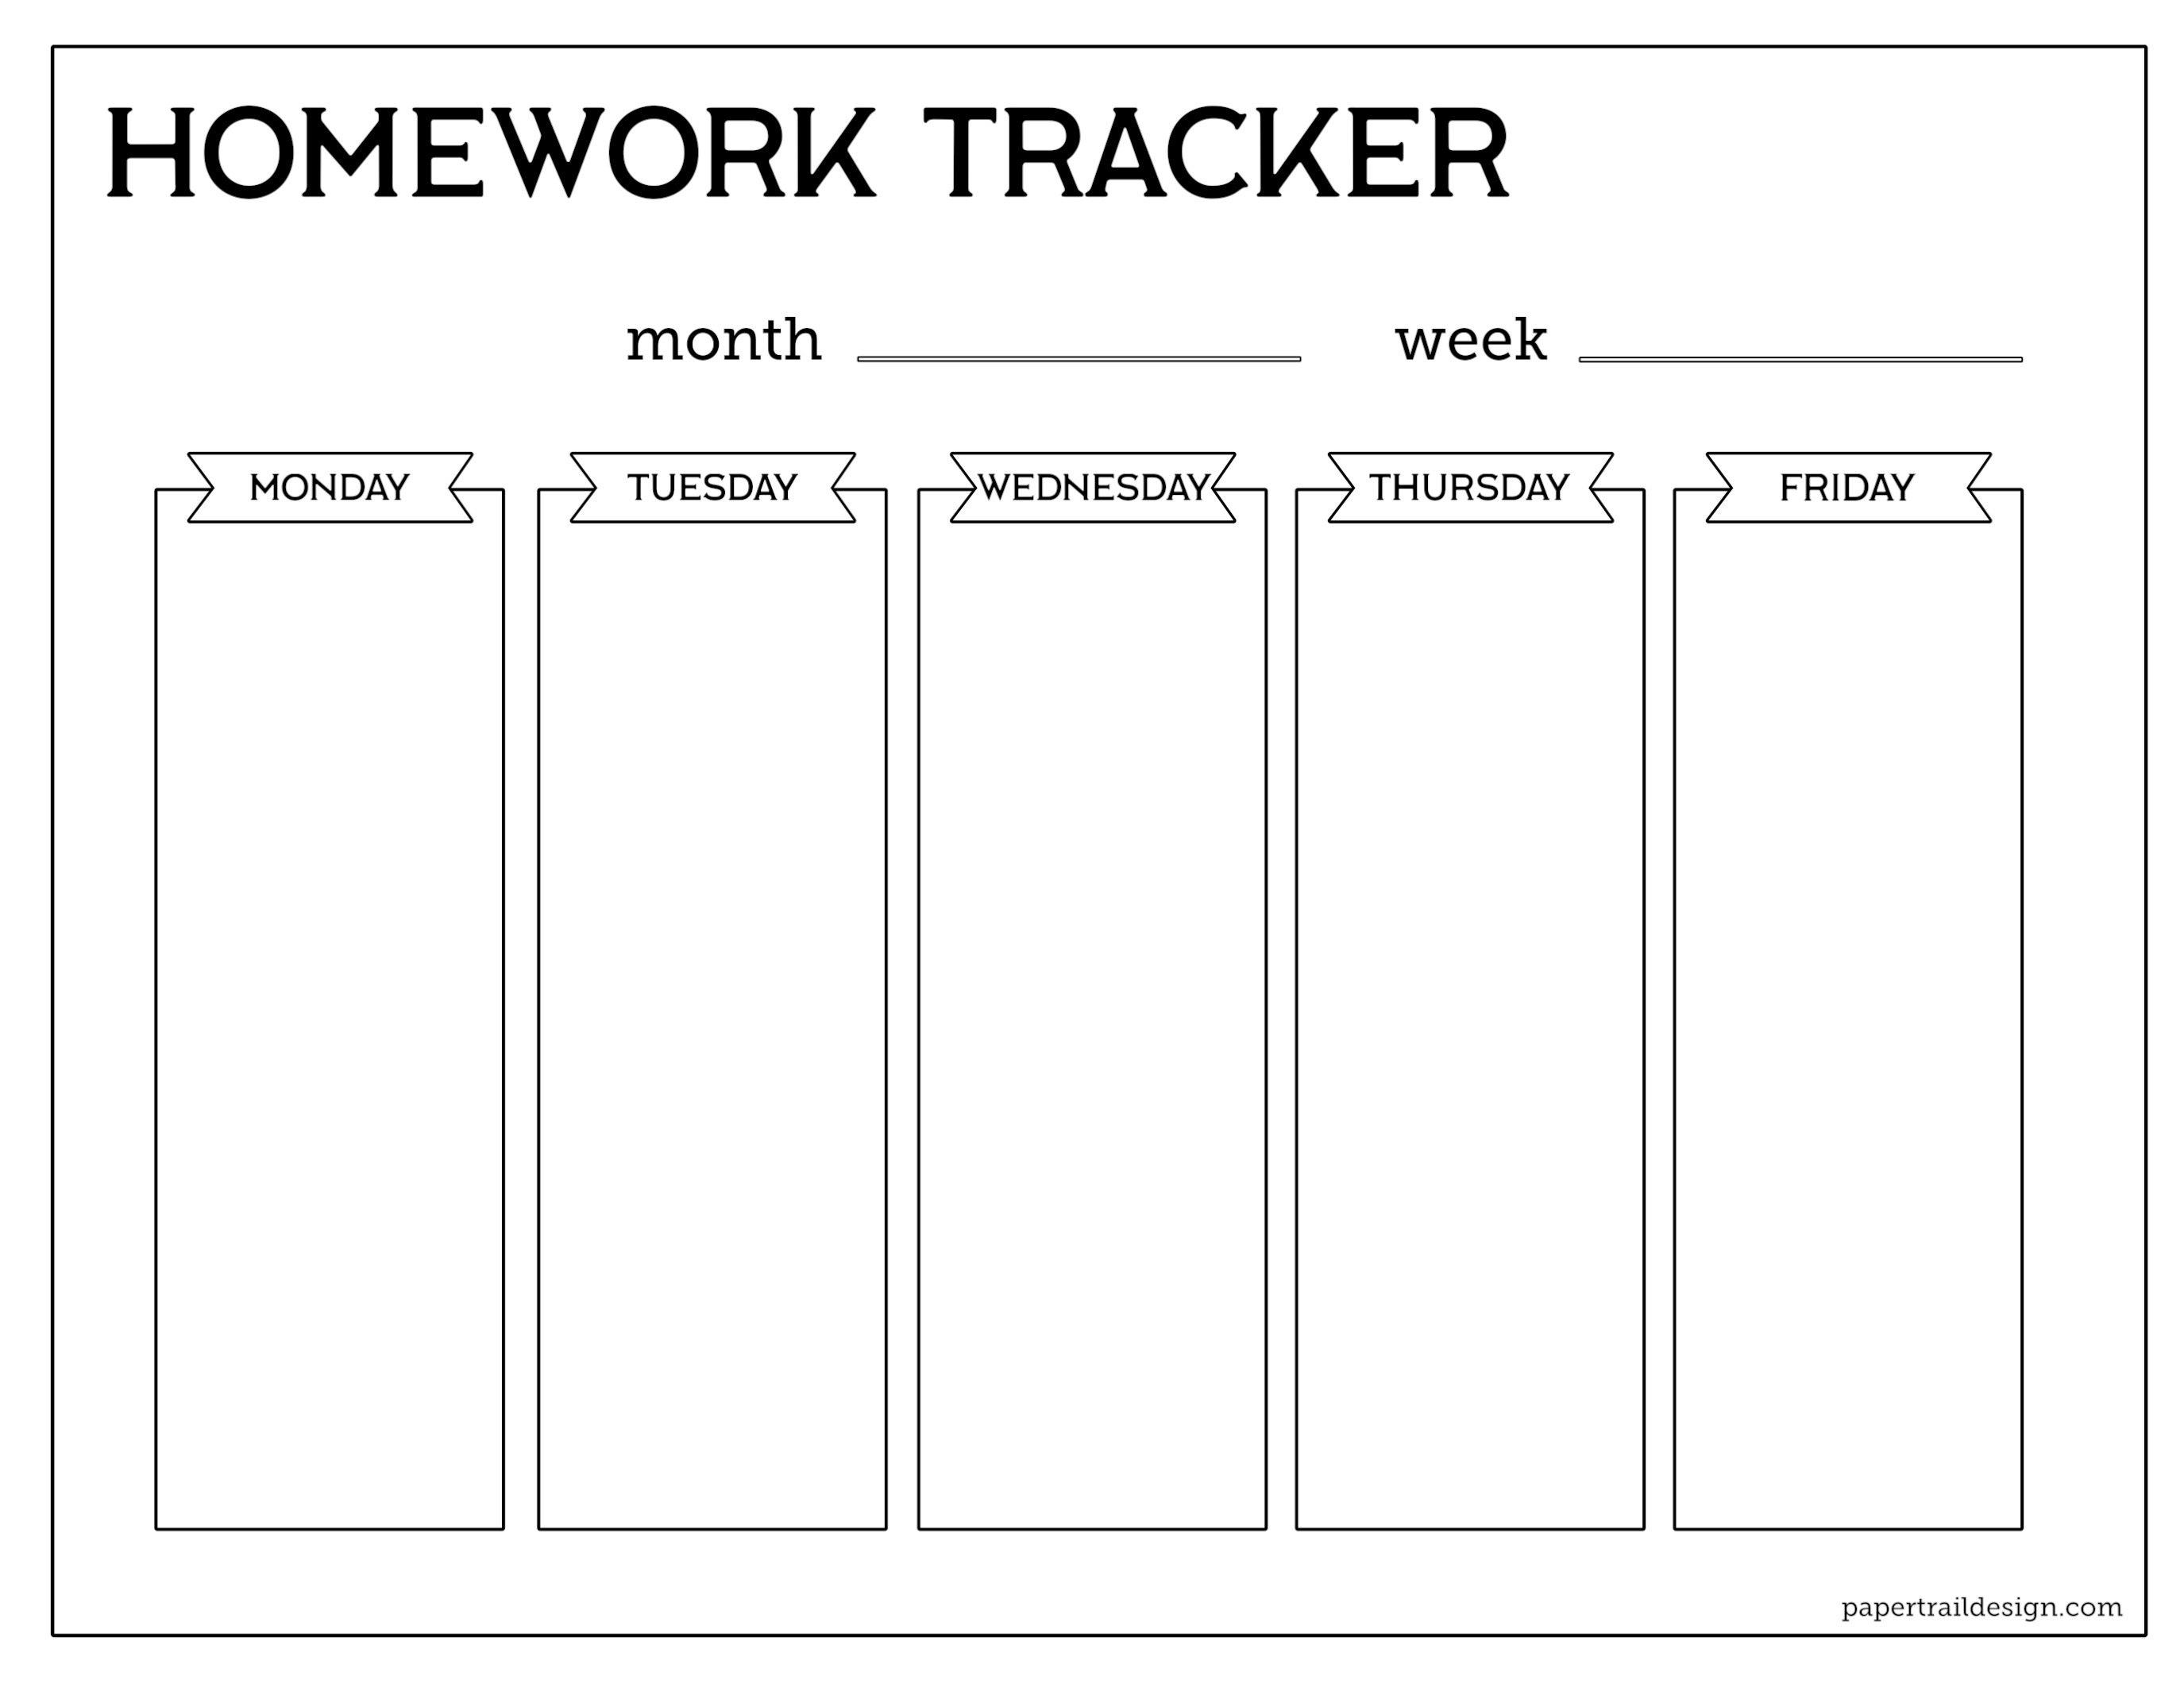 Free Printable Student Homework Planner Template  Paper Trail Design For Homework Agenda Template